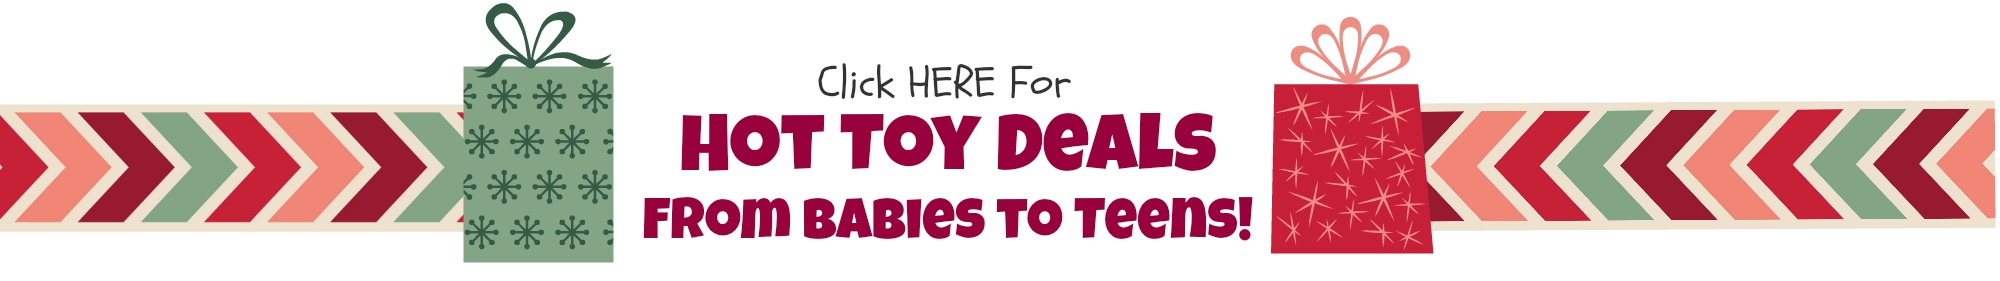 Click Here Hot Toy Deals